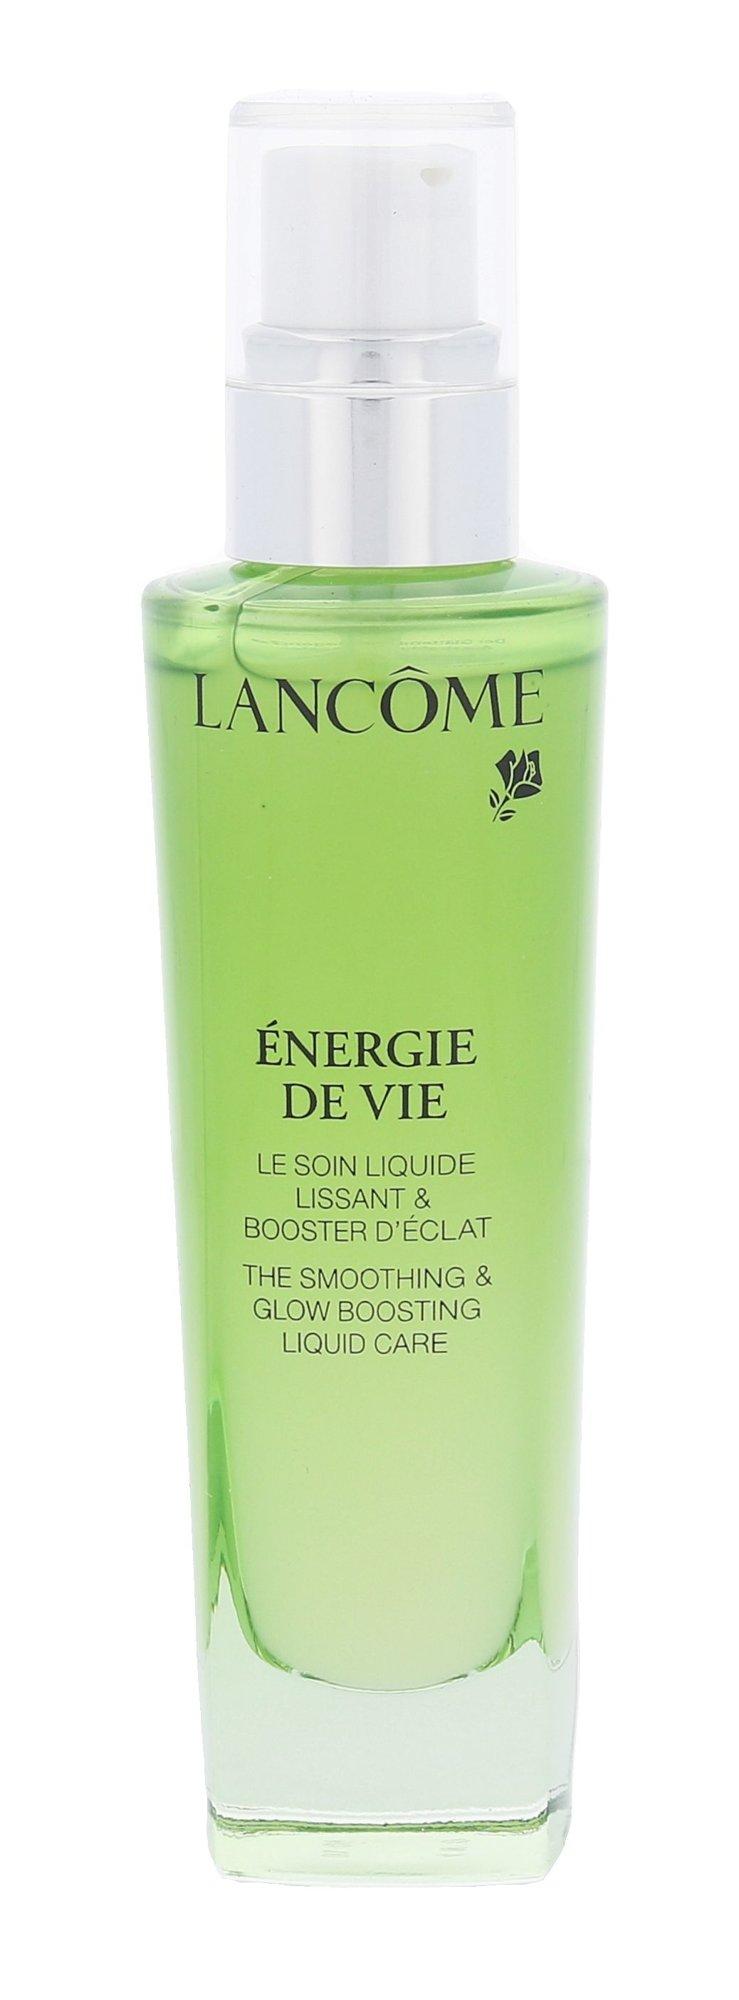 Lancôme Énergie De Vie Cosmetic 50ml